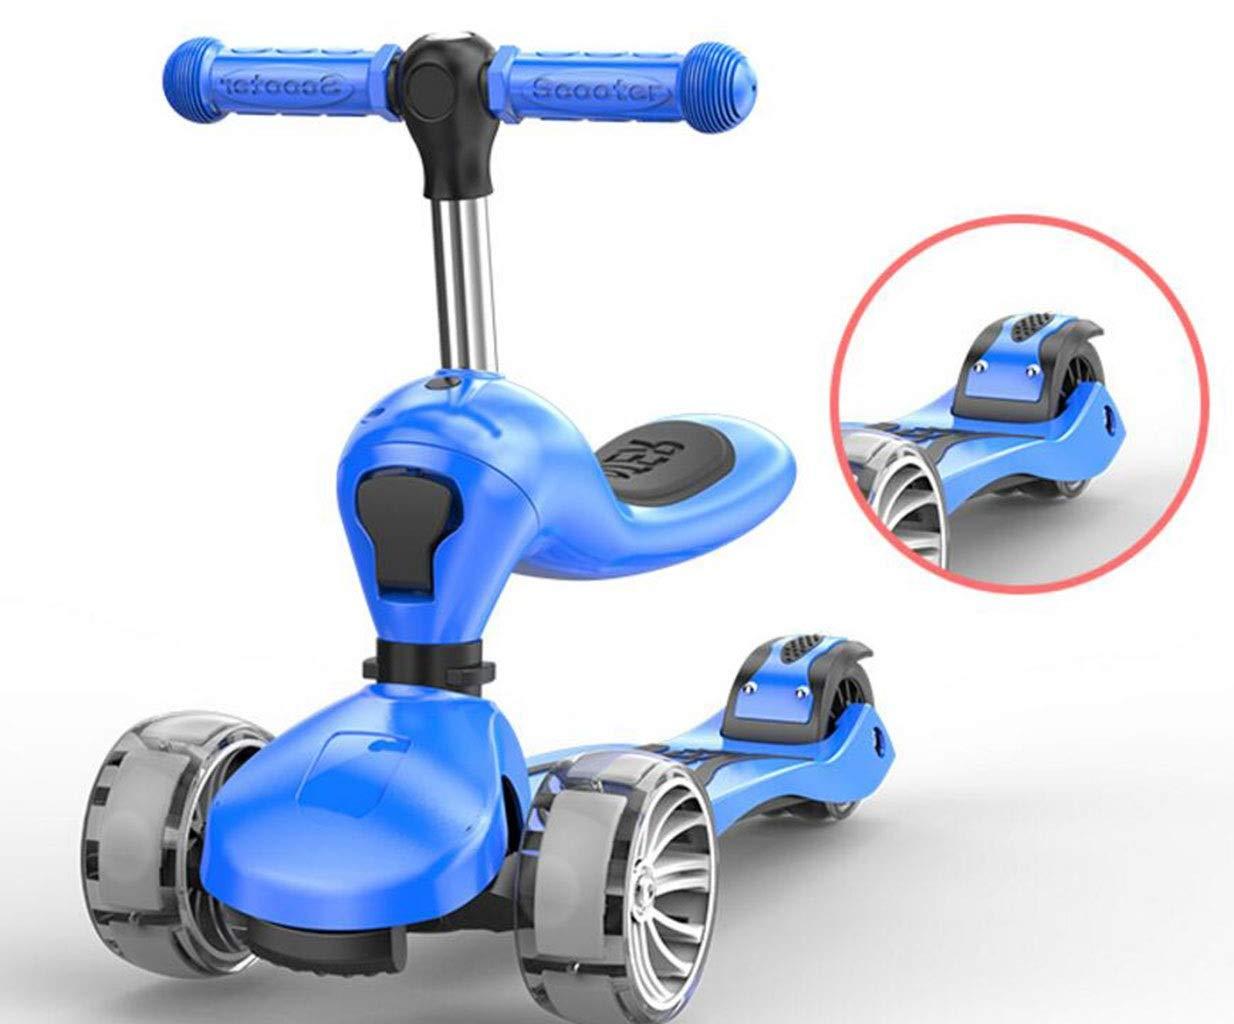 Children's scooter kick scooter children's kids 3 wheel scooter, 2 in 1 super wide wheel kids scooter, one button conversion adjustable height handle, scooter children boys and girls 1 or more childre by JBHURF (Image #8)